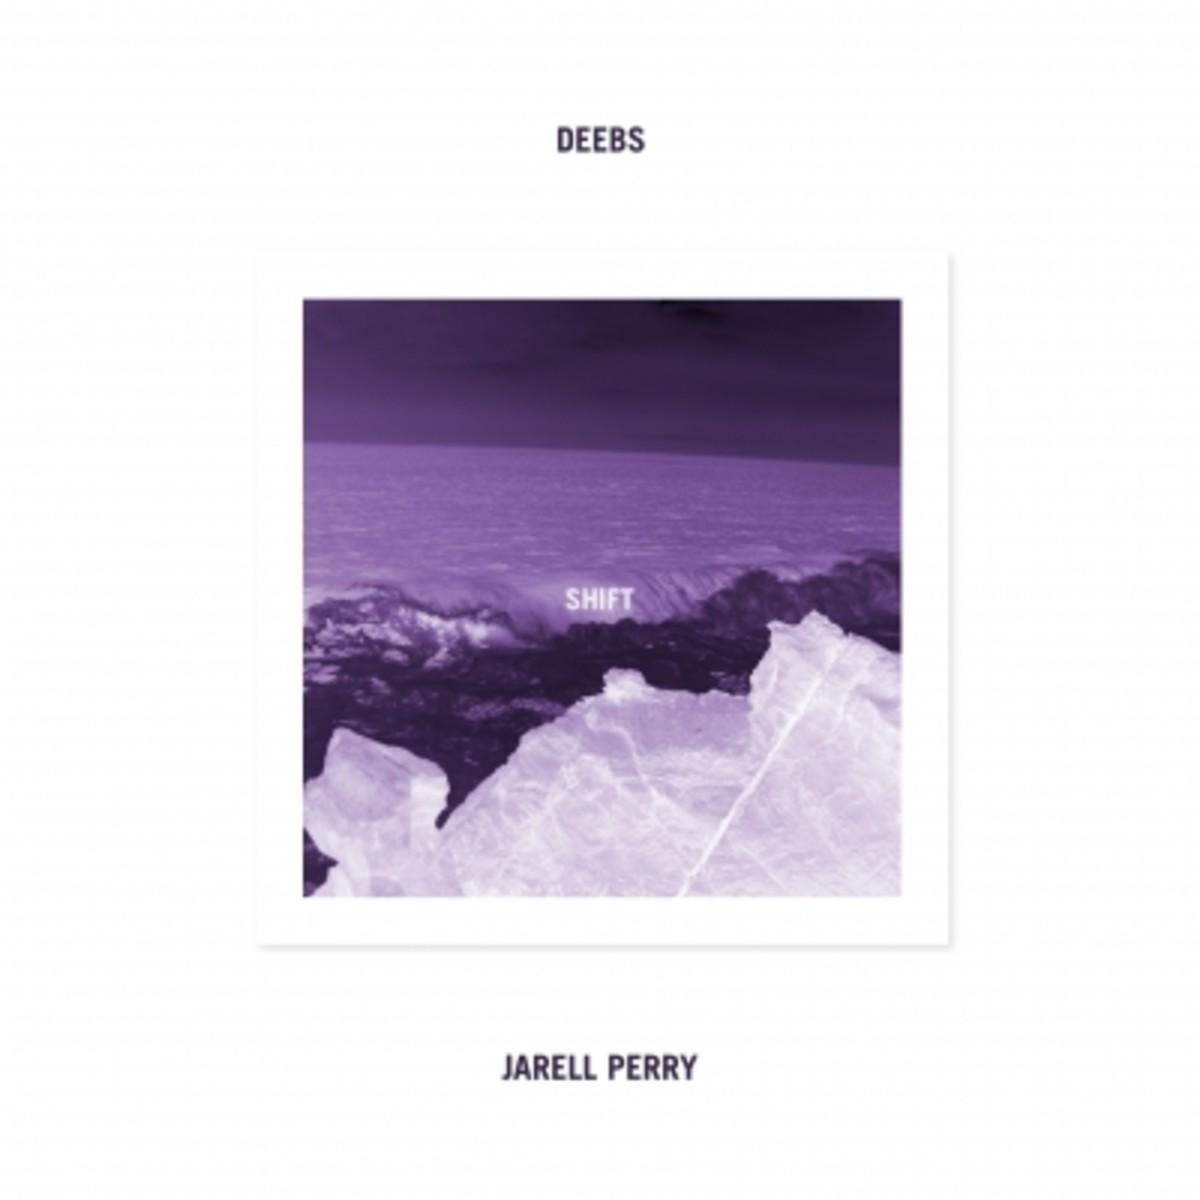 deebs-jarell-perry-shift-ep.jpg